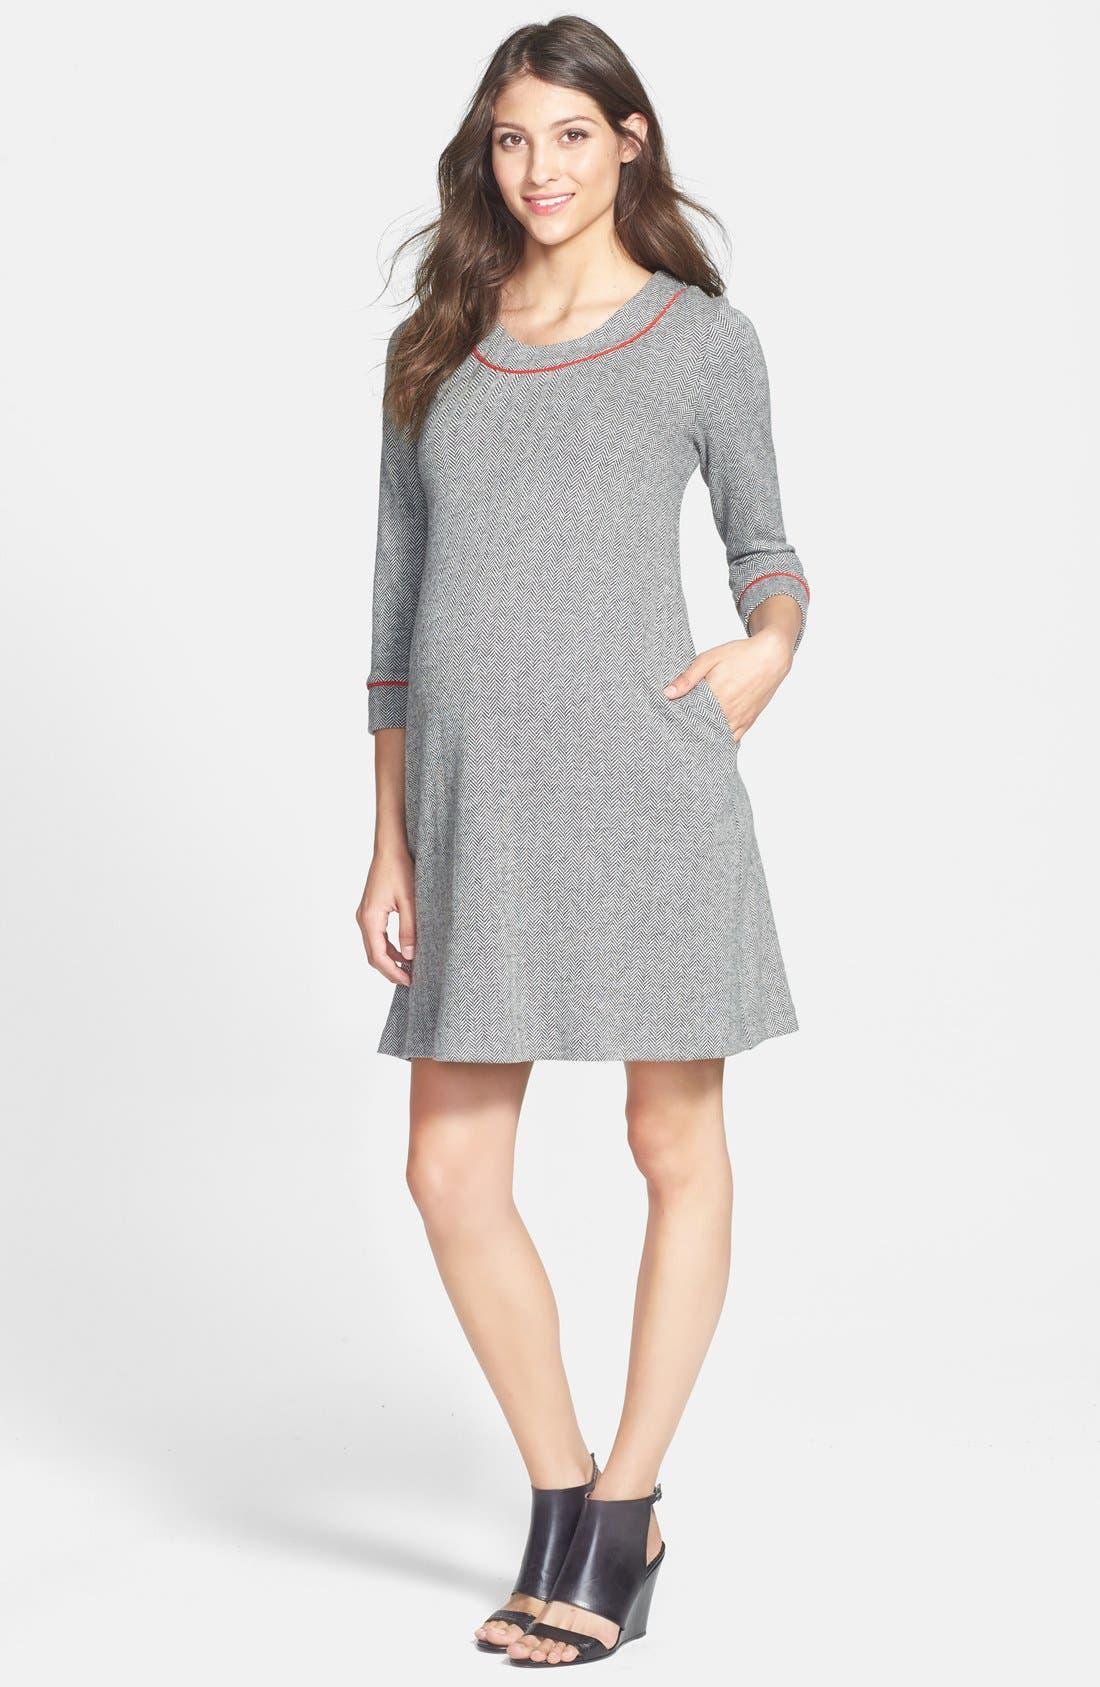 MATERNAL AMERICA Herringbone Maternity Dress